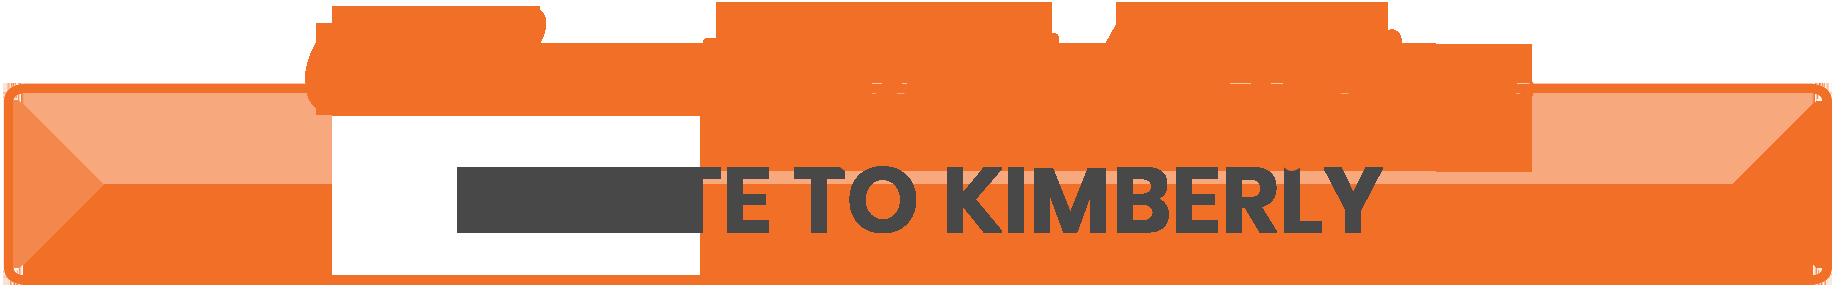 UTC Dropbox - 2020-07-14 19-40-16 - CallOutCyberbullying_RelateKIMBERLY_HEADER_07-14